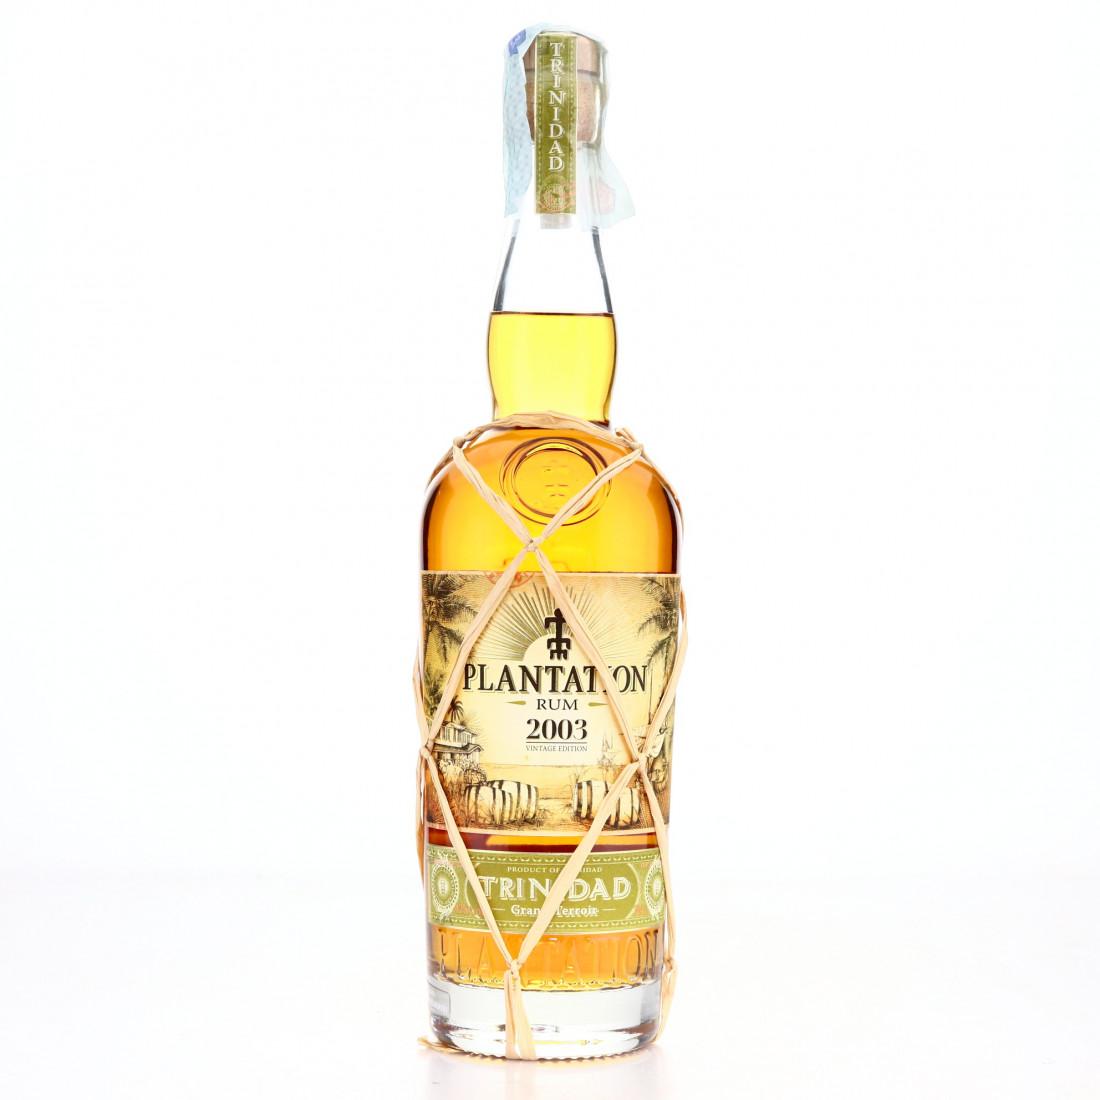 Trinidad Rum 2003 Plantation Grand Terroir